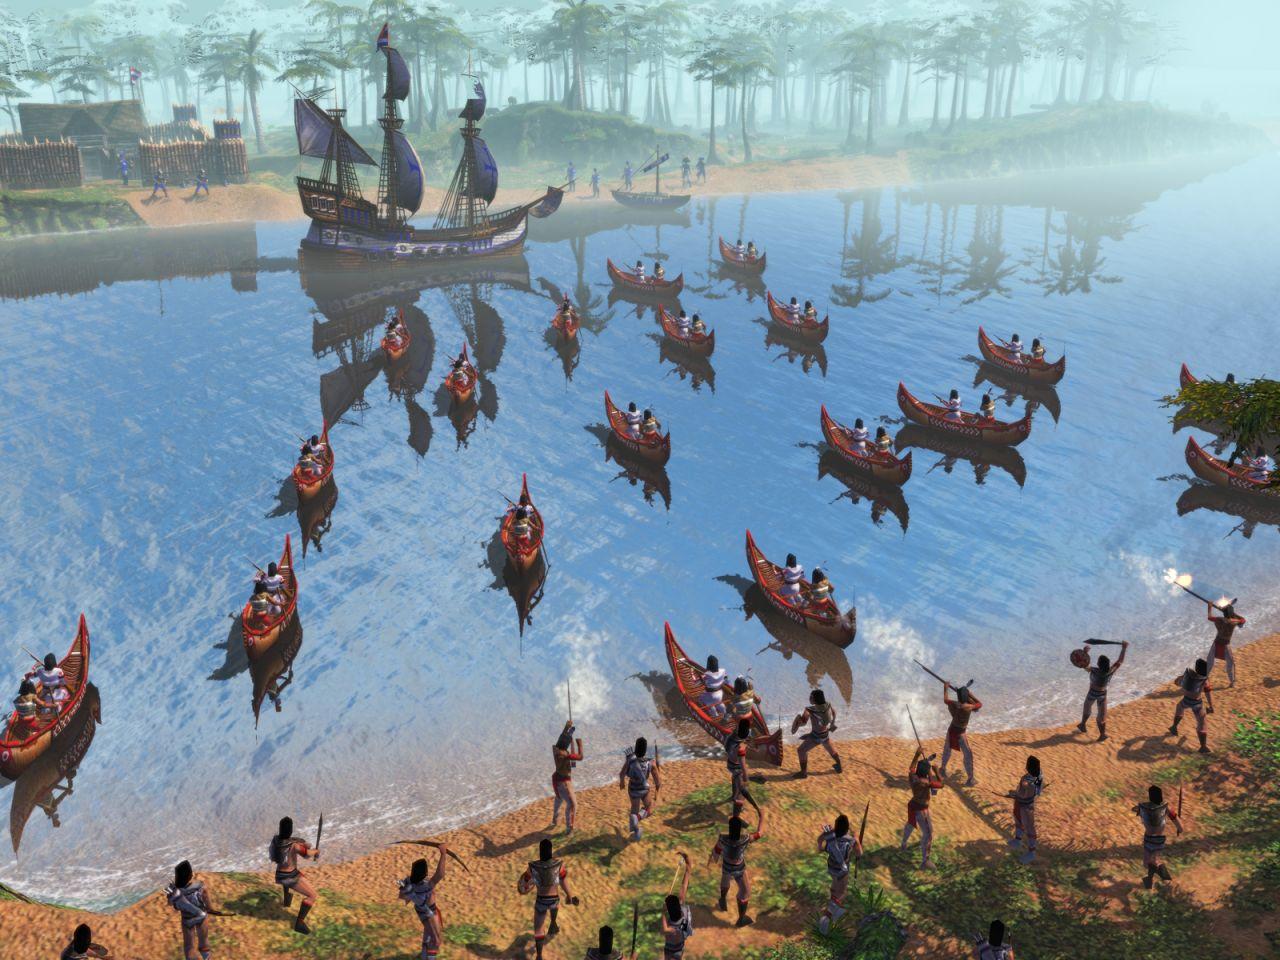 تحميل لعبة استراتجية Age of Empires III كاملة رابط 1 مباشر  Age-of-empires-3-the-warchiefs-3_b